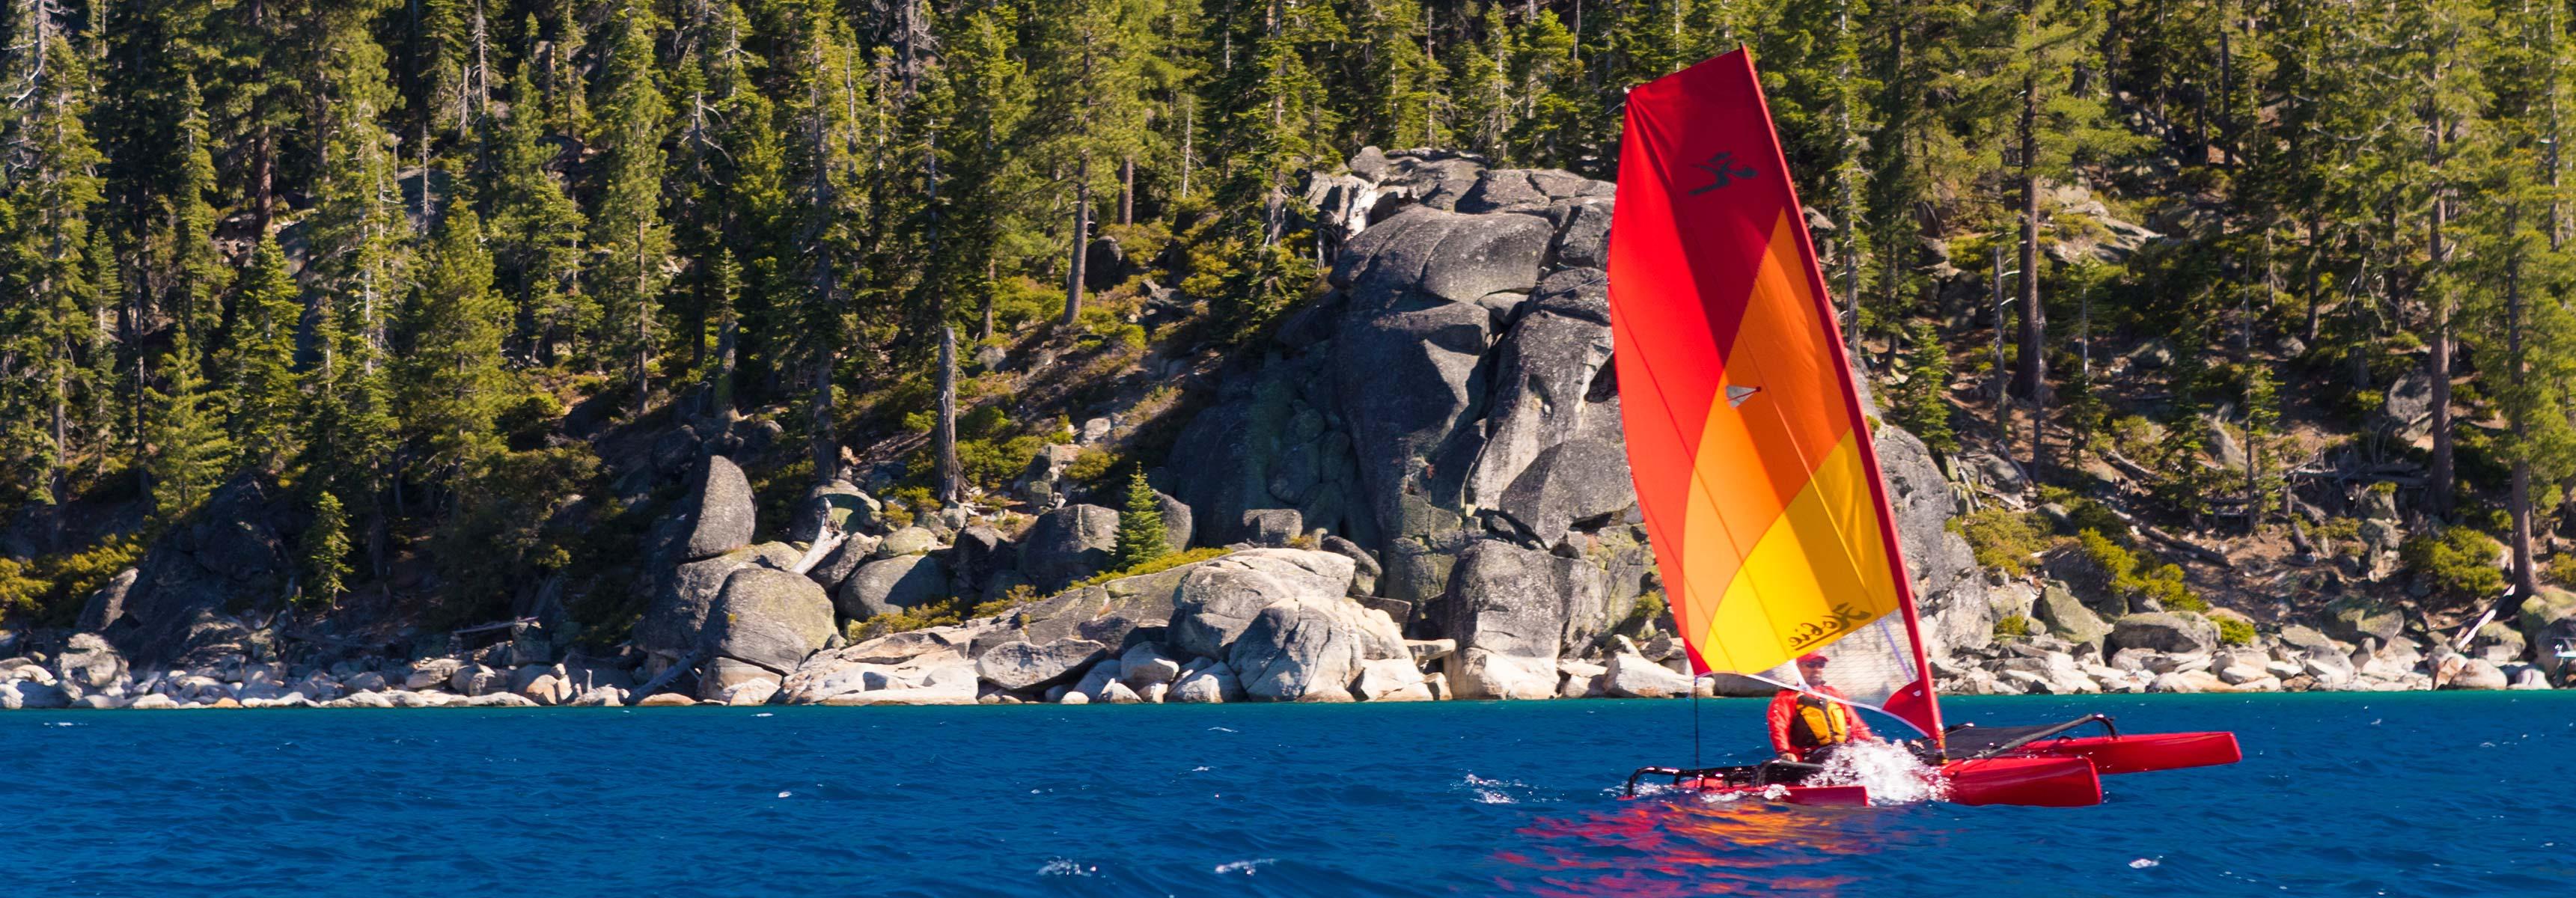 Mirage Adventure Island mobile header image